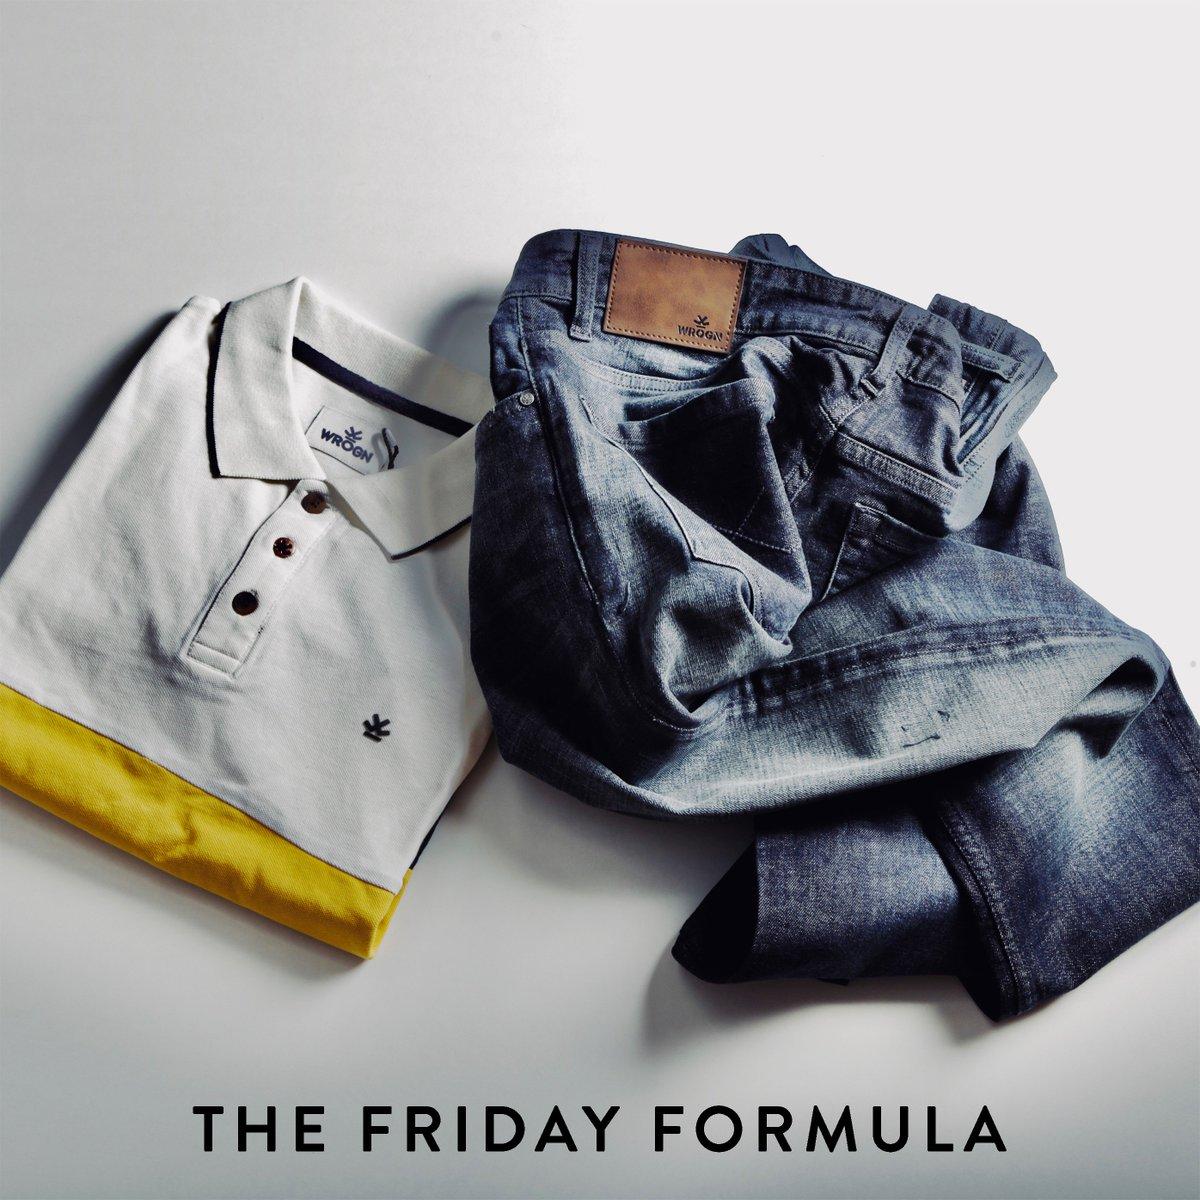 299d4bfeb0a Shop at http   www.wrogn.in .  Tshirt  Denim  Distressed  Fashion  Trend   StayWrogn  style  love  ootd  men  like  streetstyle  mensfashion   instafashion ...